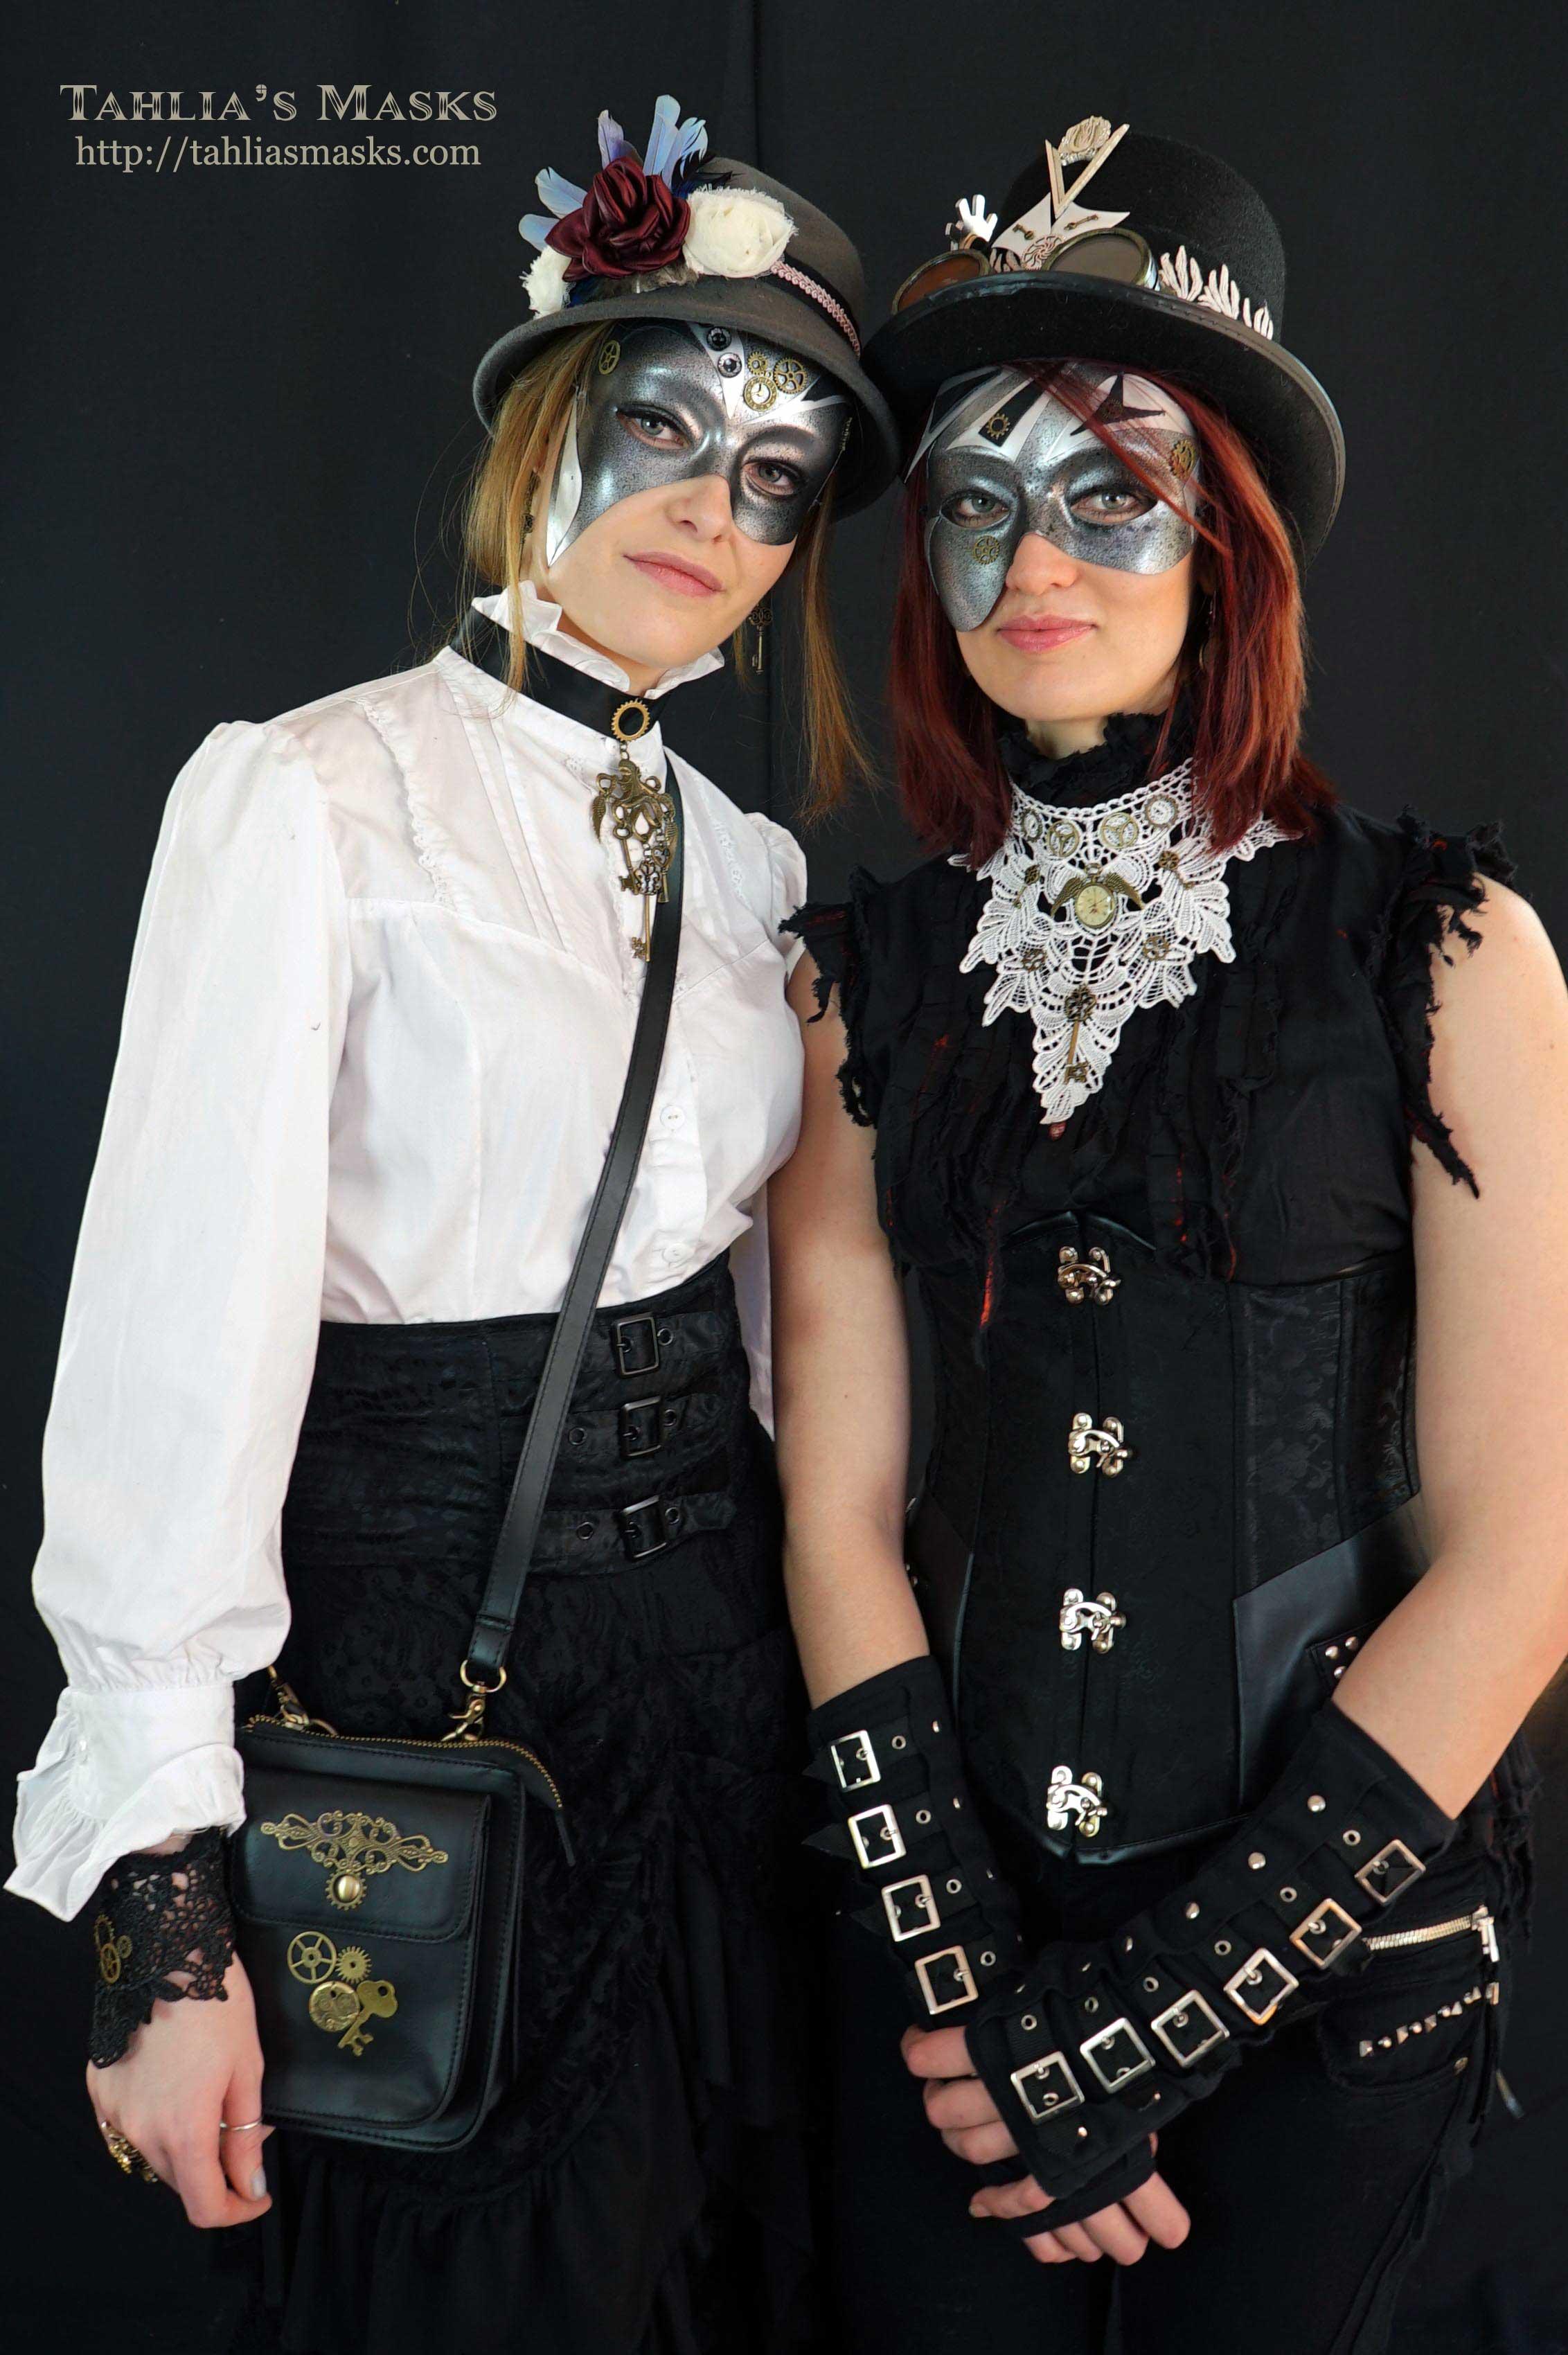 DSC02711_web  sc 1 st  Tahliau0027s Masks & Steampunk masquerade masks with steampunk costumes - Tahliau0027s Masks